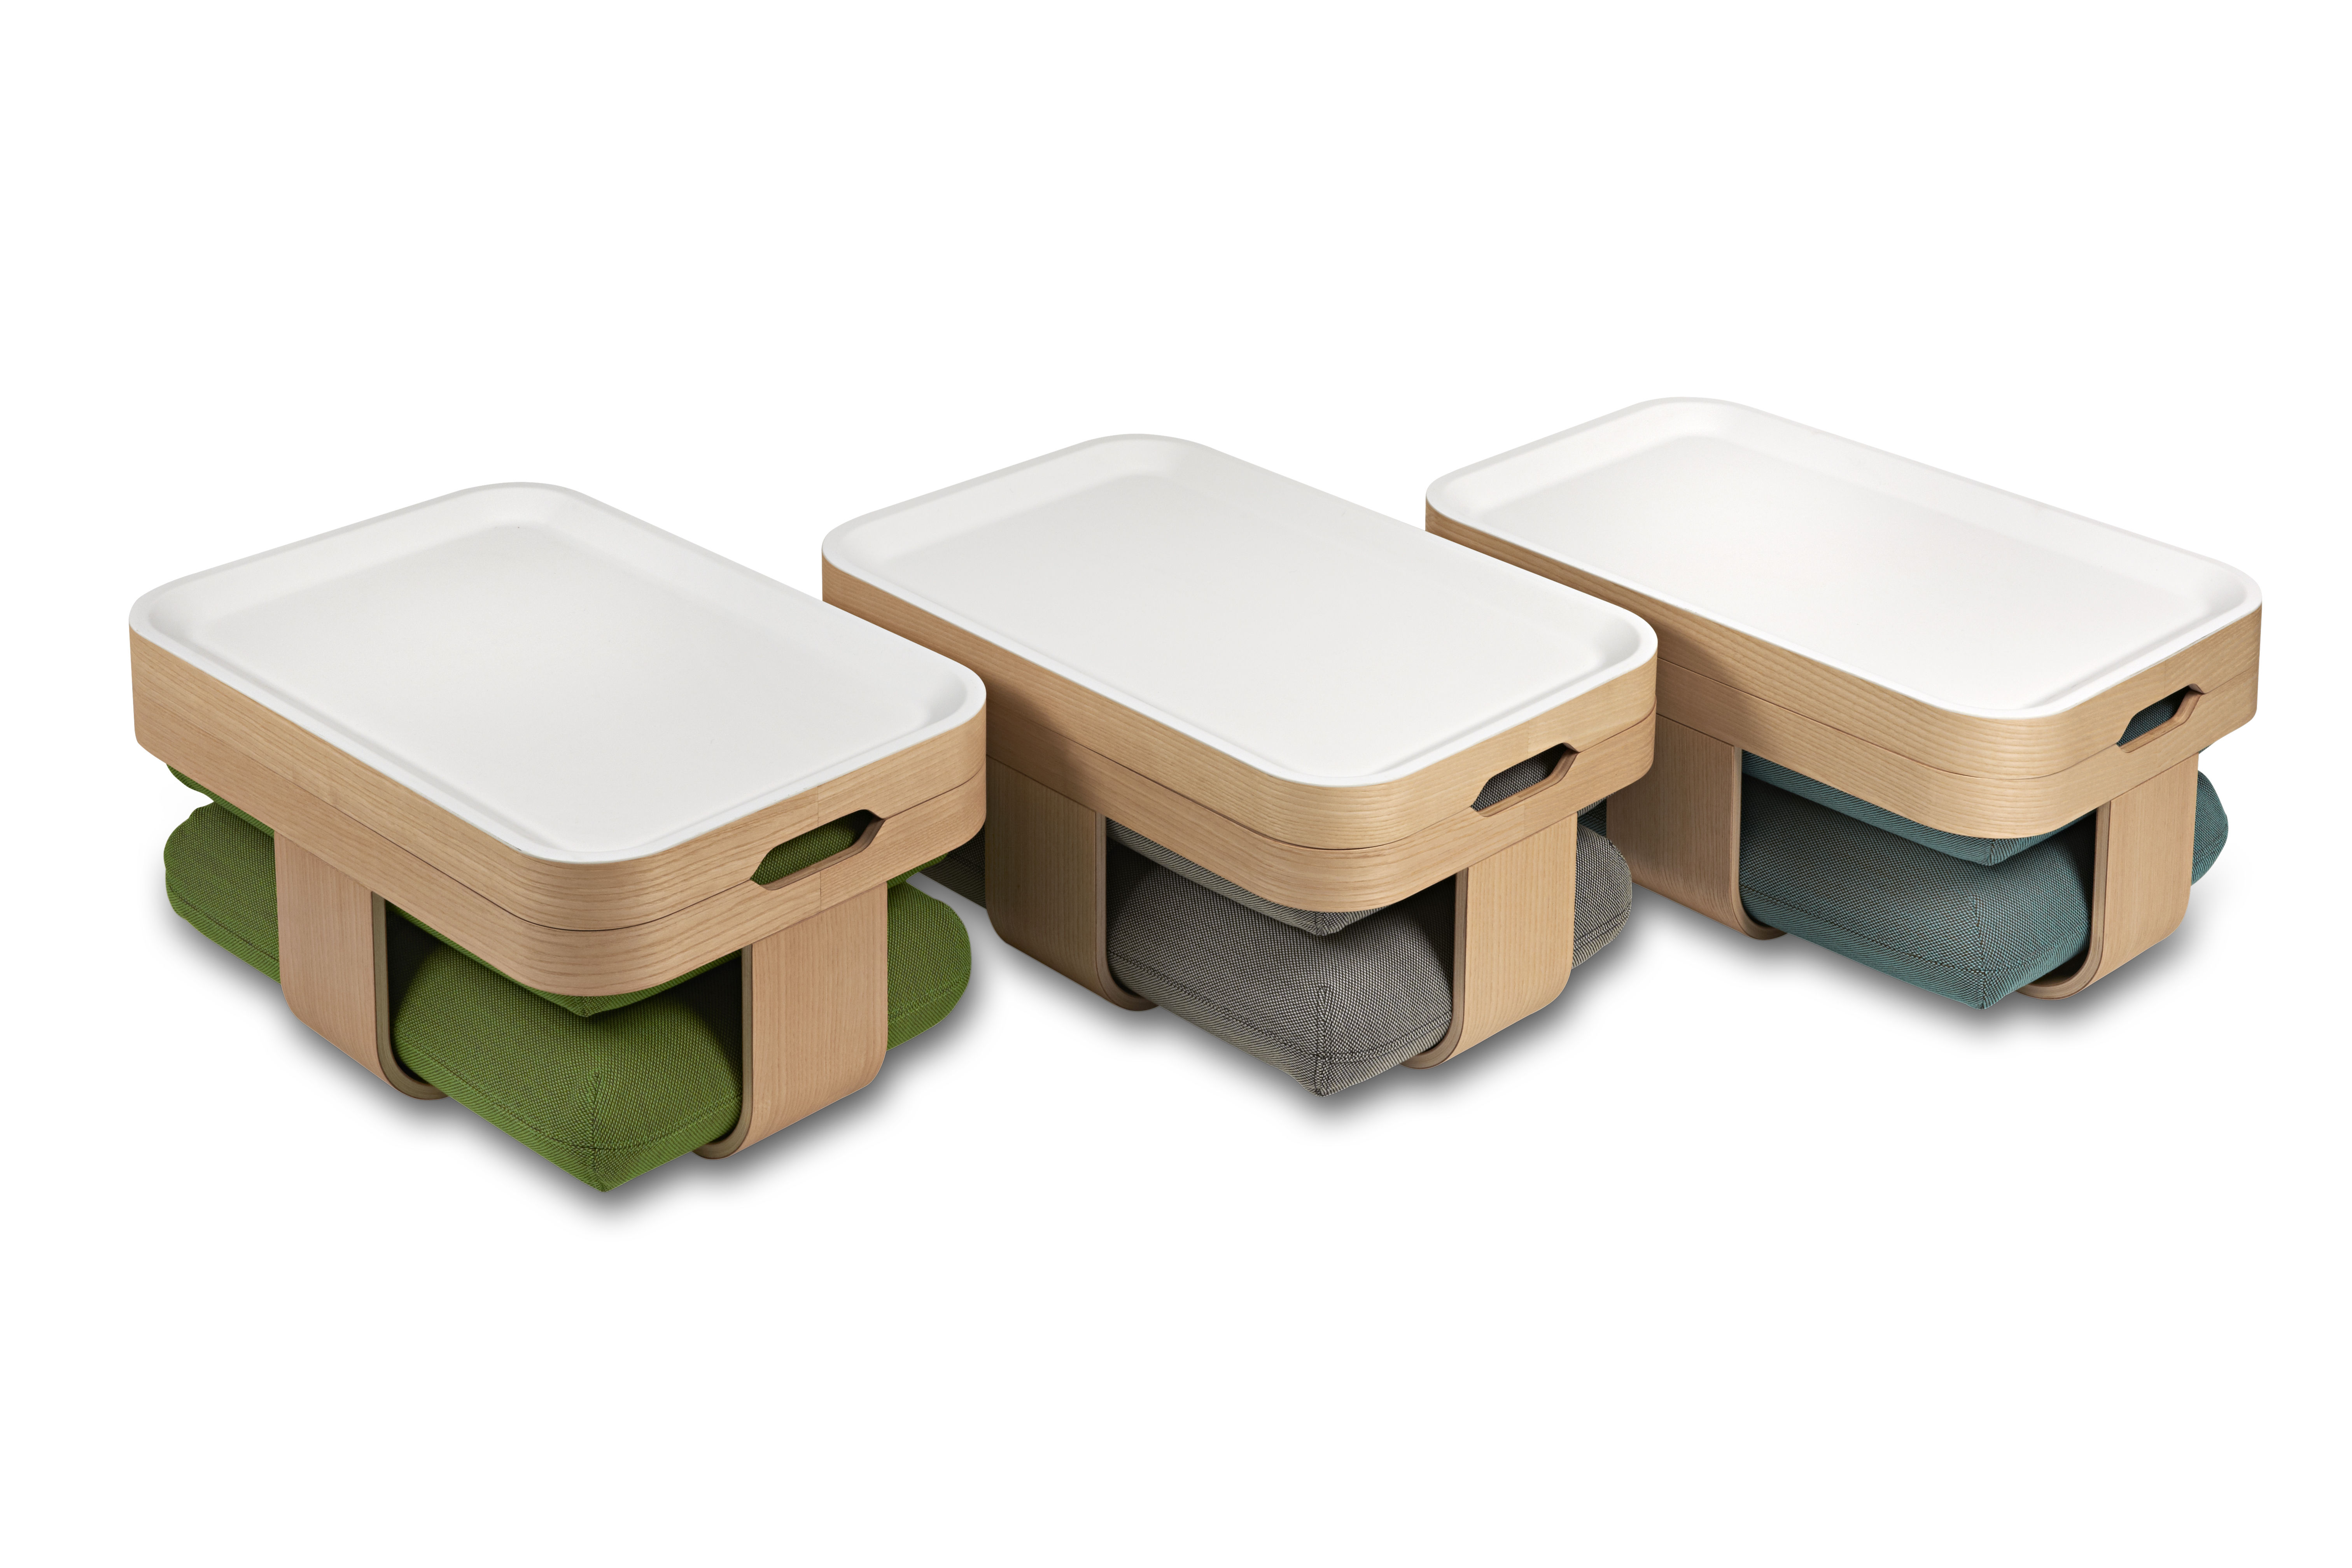 Table basse mister t transformable en pouf et repose pieds for Table basse design 3 pieds